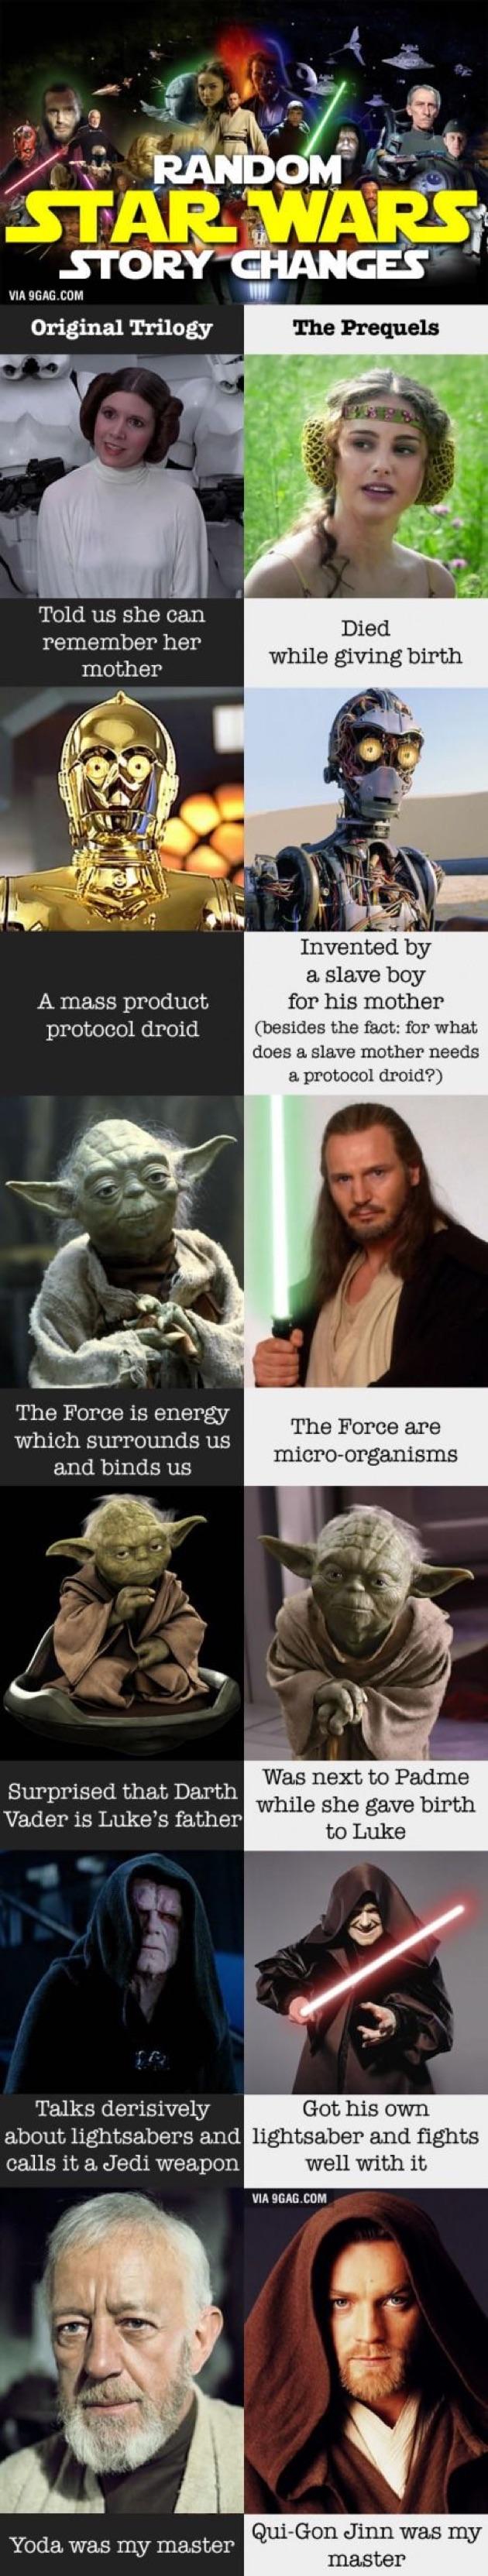 Star Wars Force Awakens Funnies Star Wars Facts Star Wars Humor Star Wars Memes